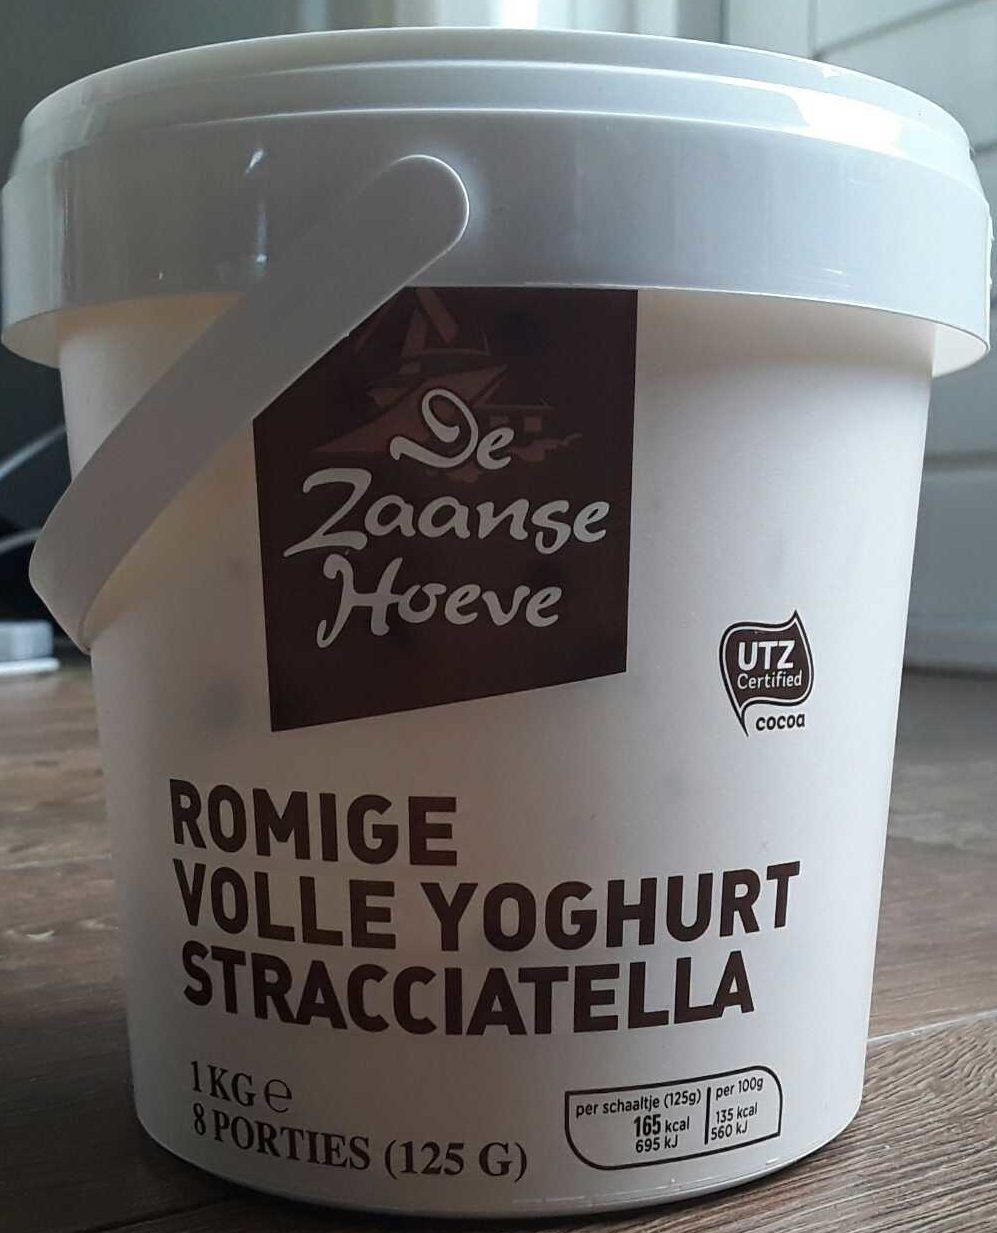 Romige volle yoghurt stracciatella - Product - nl